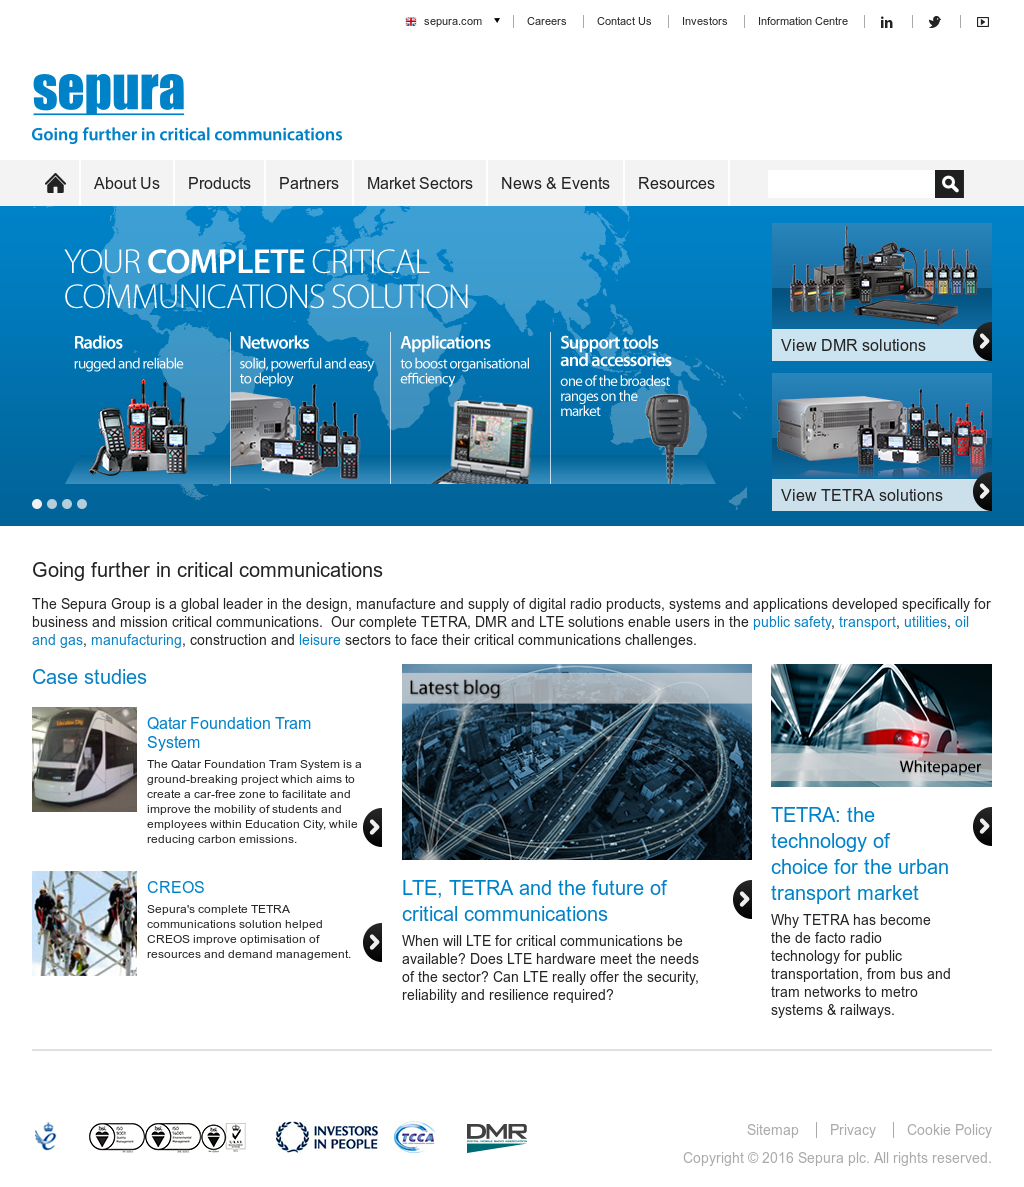 Sepura Competitors, Revenue and Employees - Owler Company